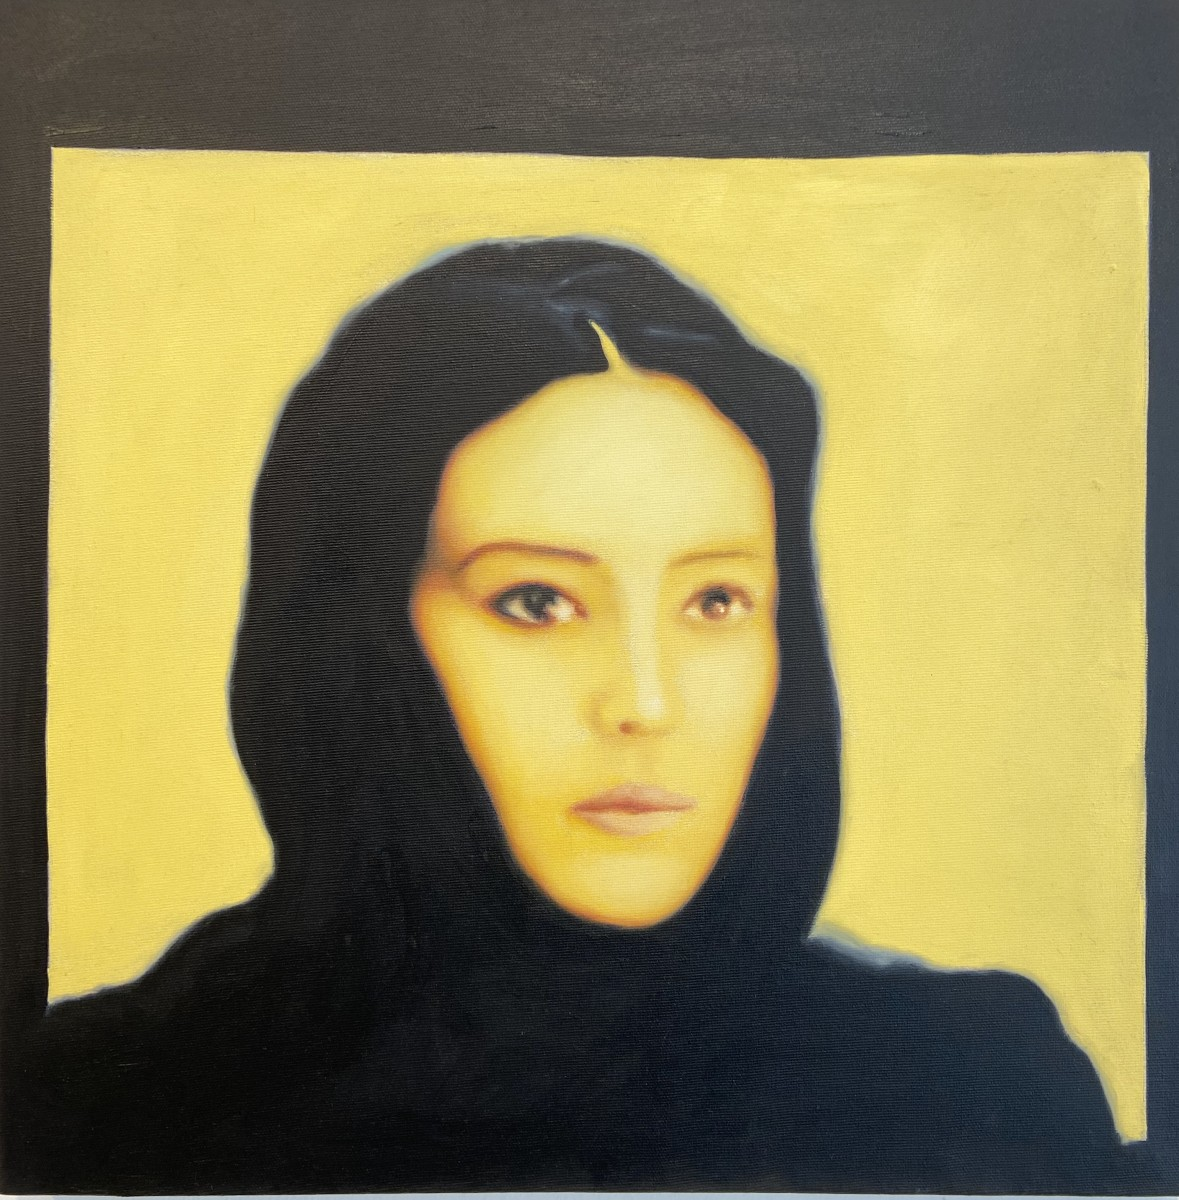 S- 2, Meir Pichhadze, Oil on 50 x 50 cm, 22,000 sekel